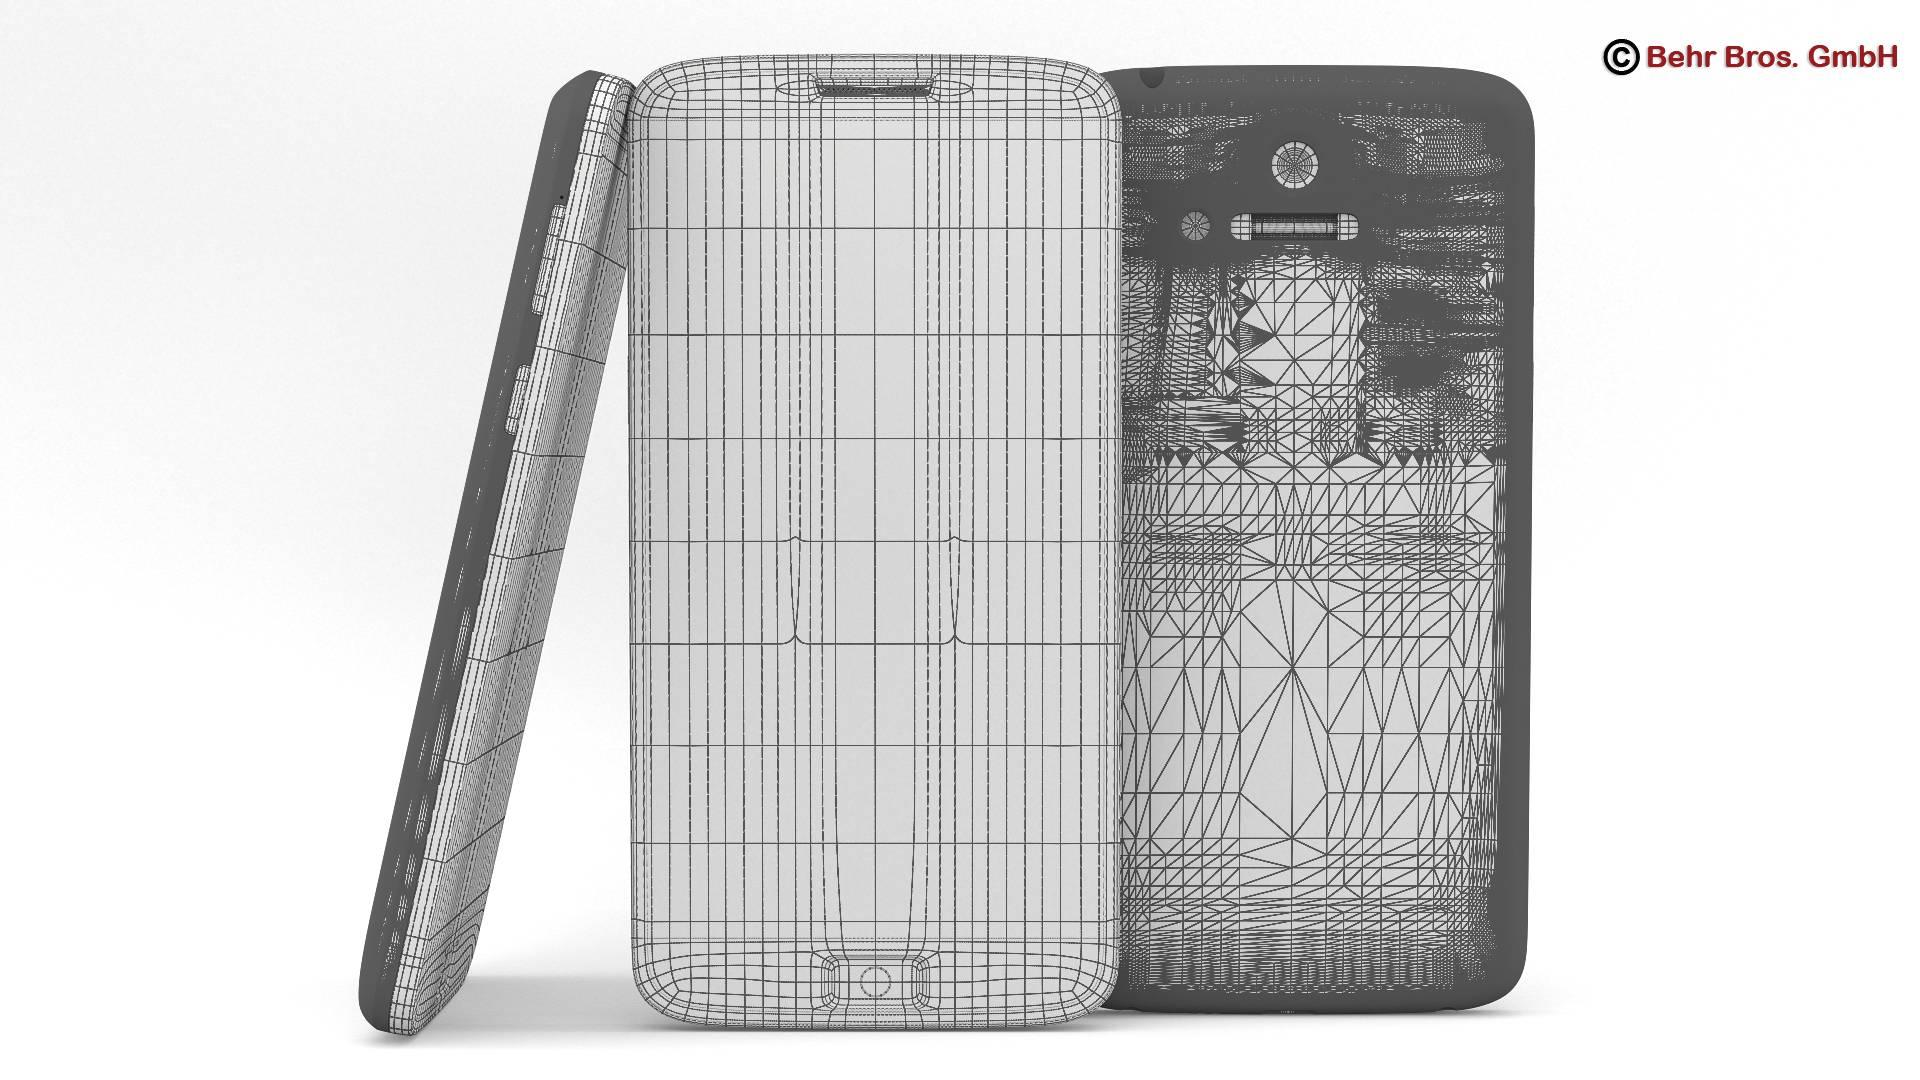 generic smartphone 5.2 inch 3d model 3ds max fbx c4d lwo ma mb obj 161657